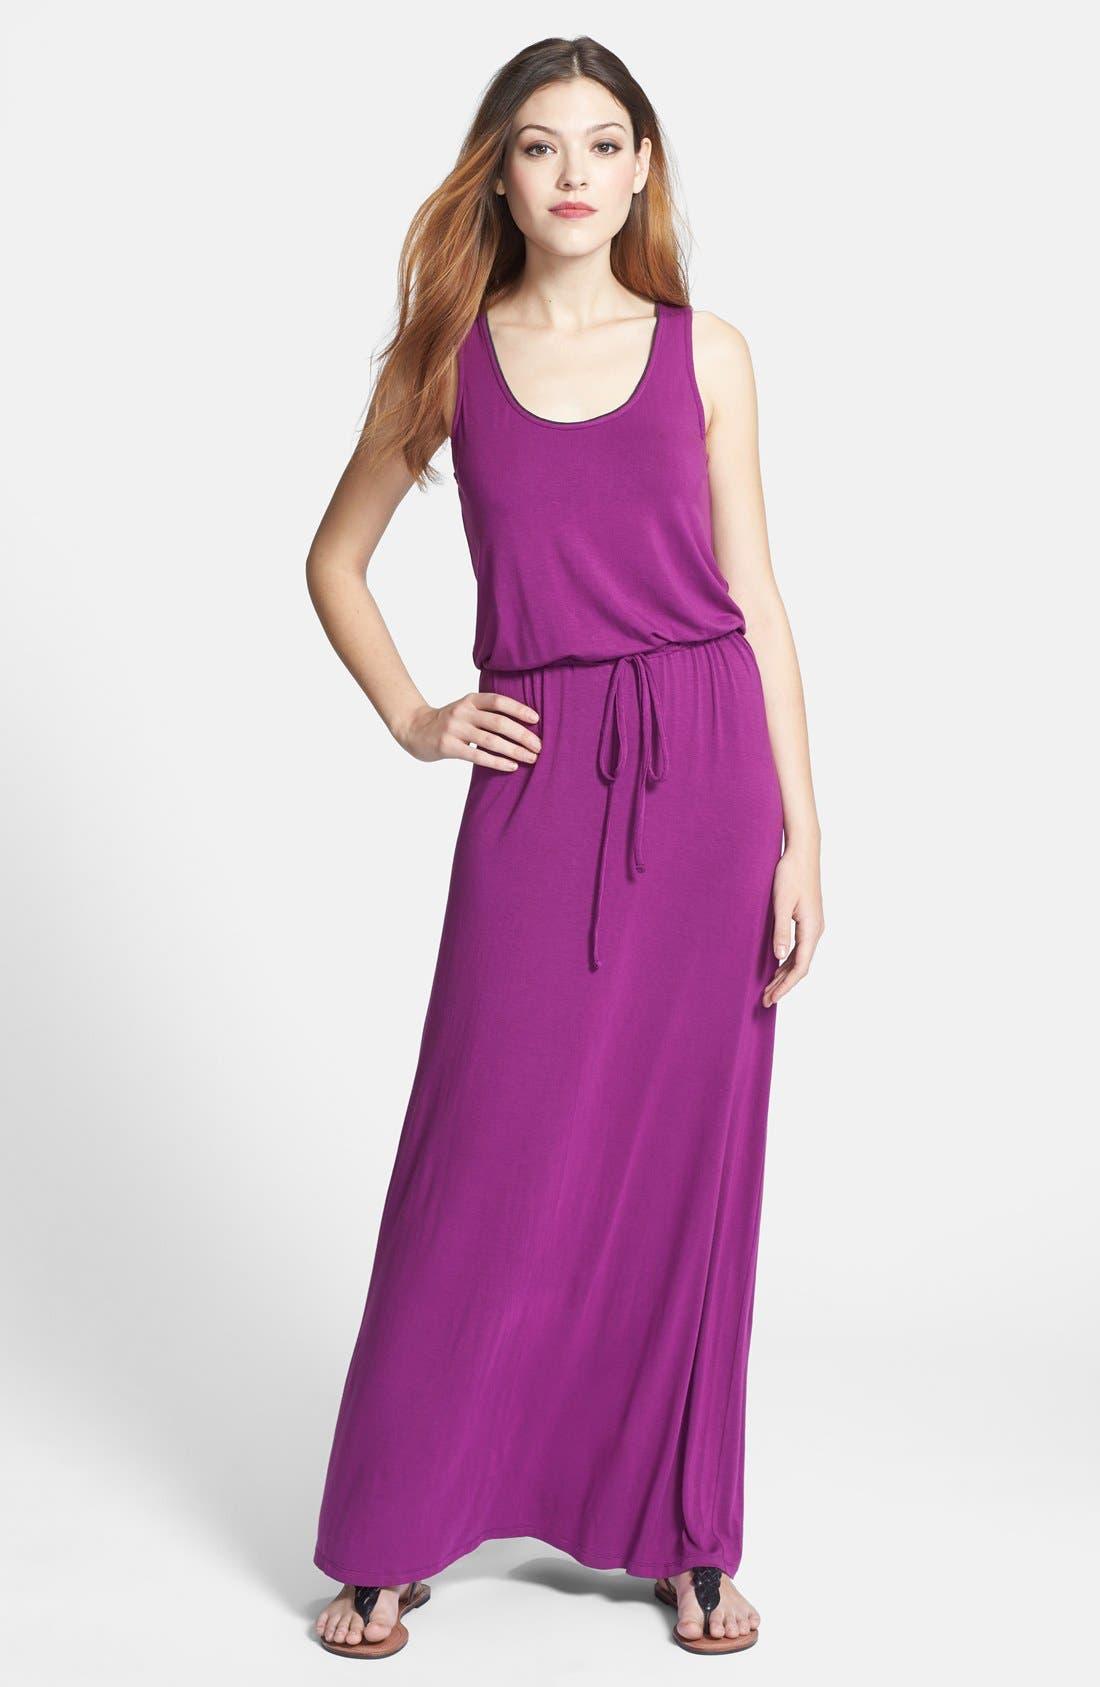 Contrast Stripe Racerback Maxi Dress,                             Main thumbnail 1, color,                             Purple Phlox/ Heather Charcoal